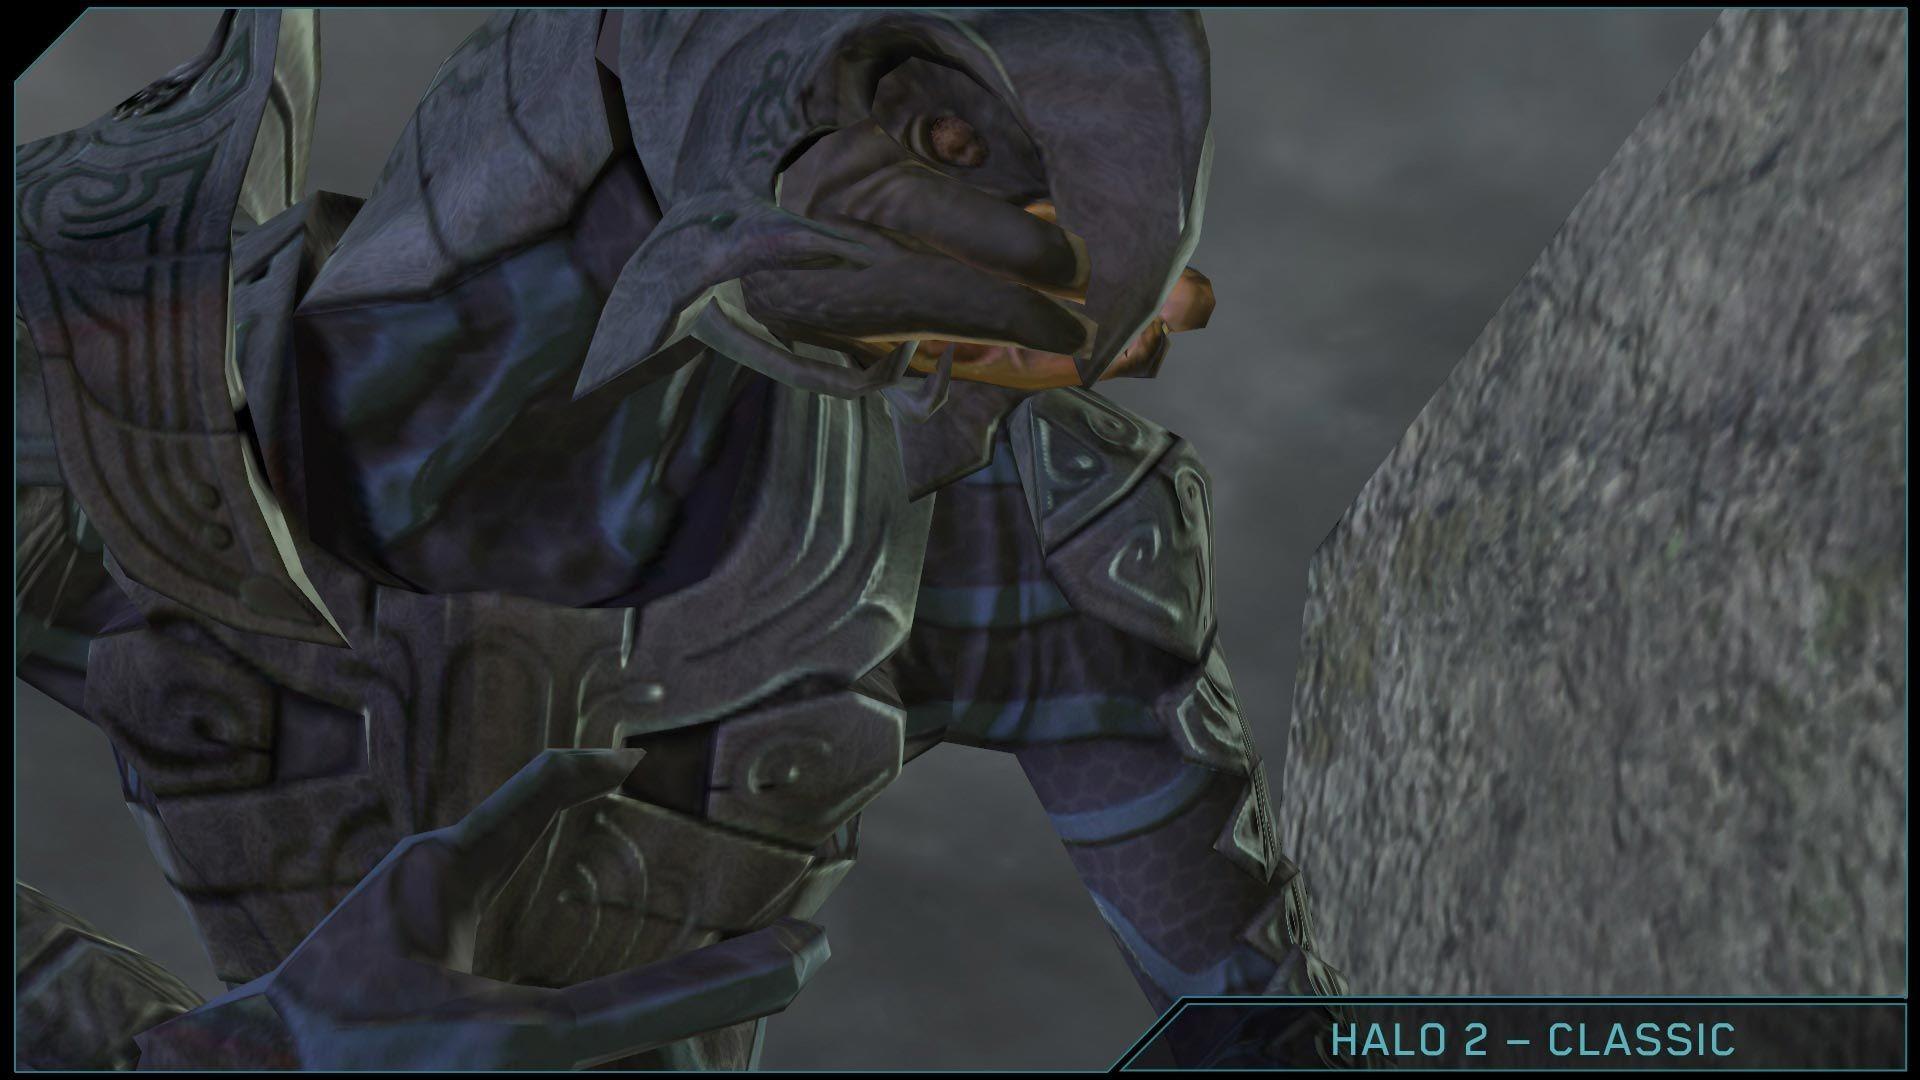 Halo 2 Classic Screenshot 1. Halo The Master Chief …